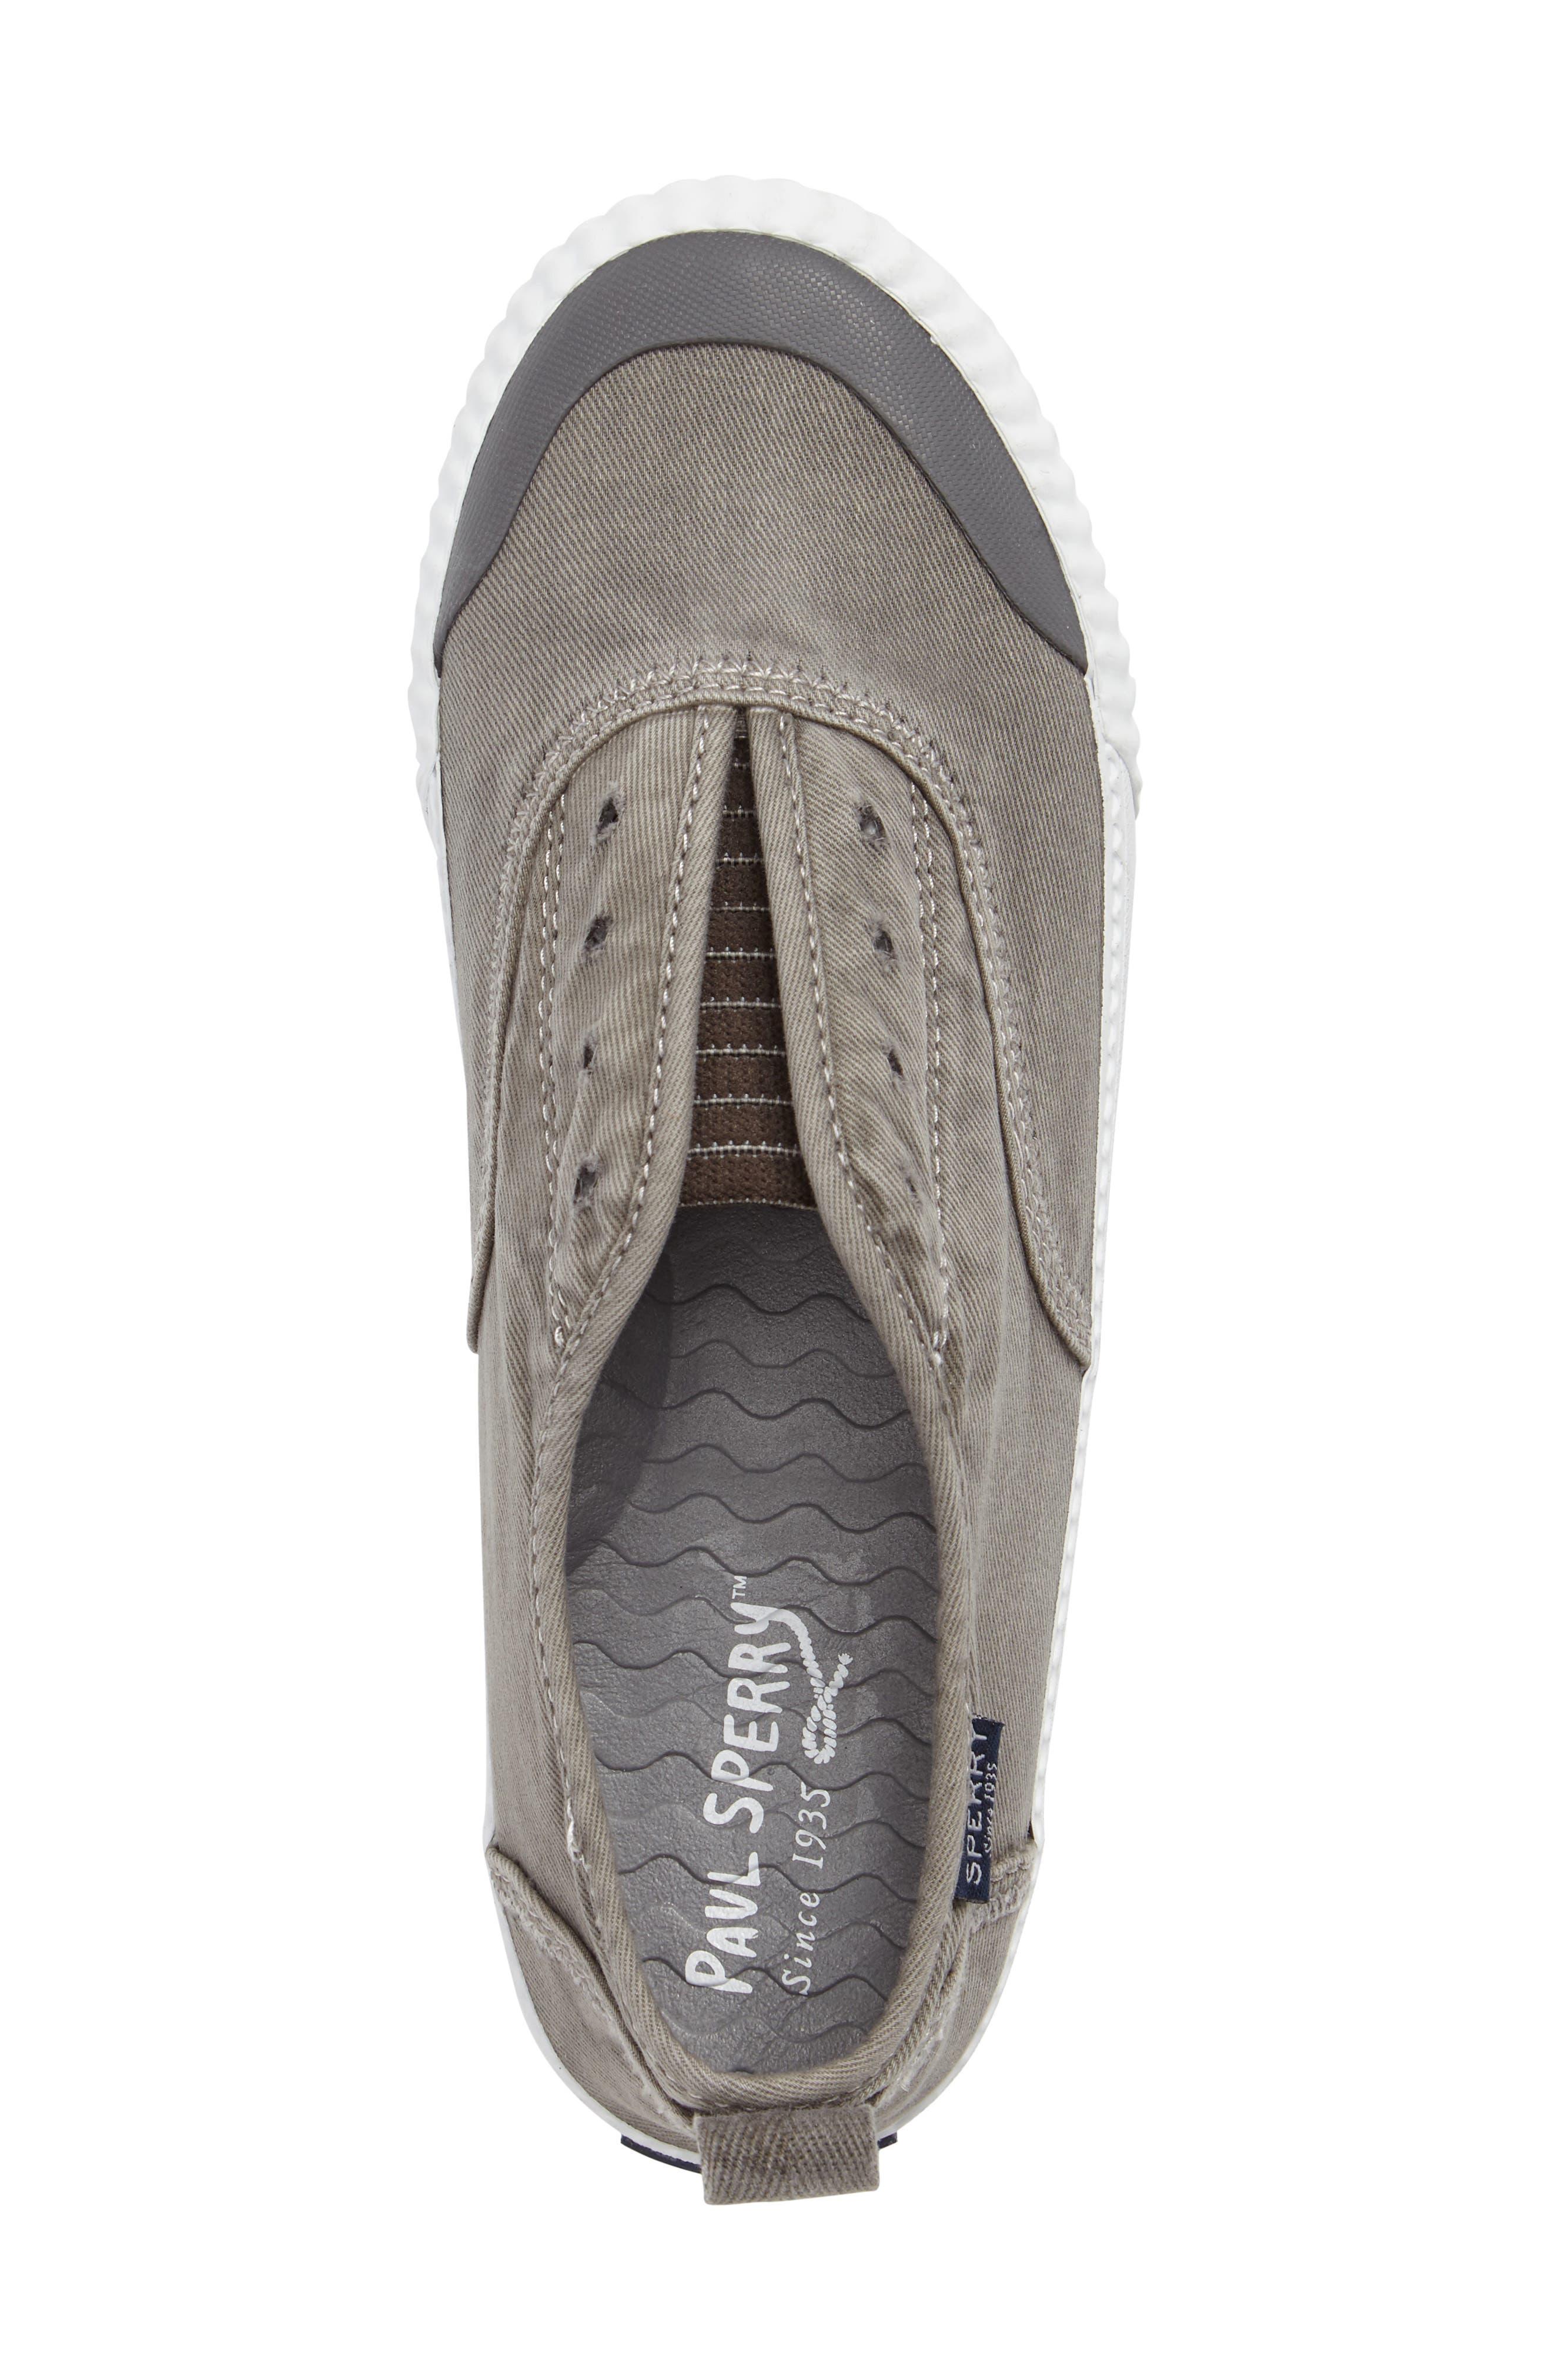 Sayel Slip-On Sneaker,                             Alternate thumbnail 5, color,                             GREY FABRIC